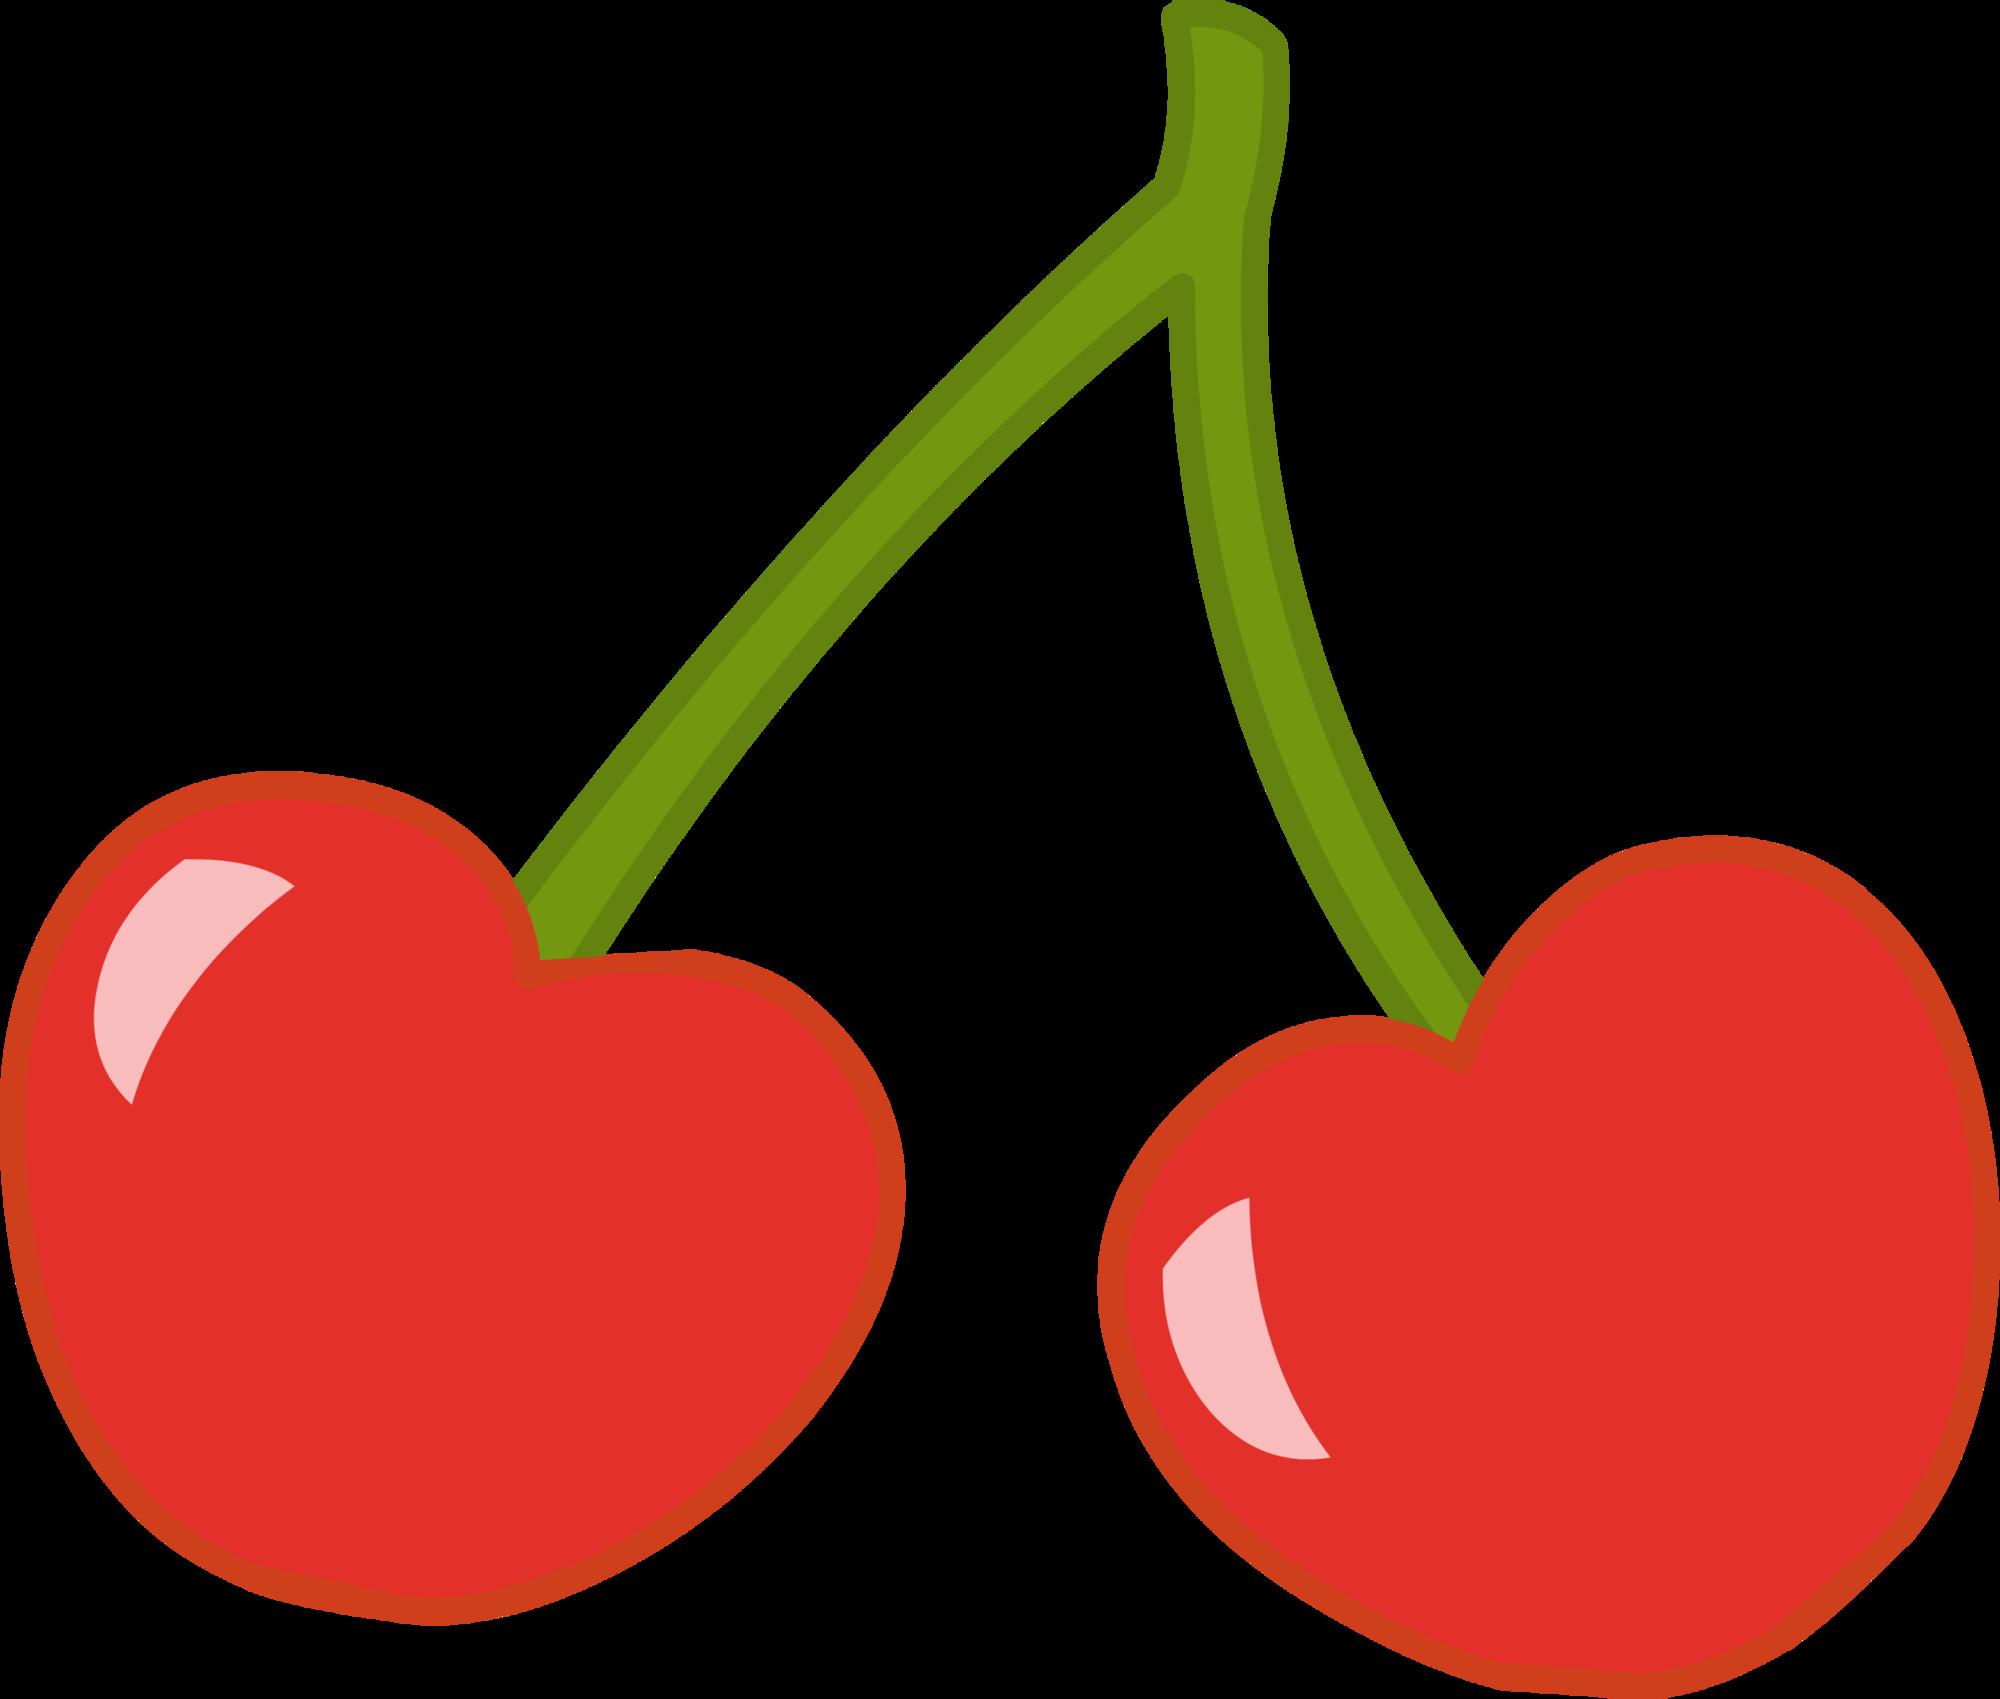 Heart clipart cherry. Image happystudio png my